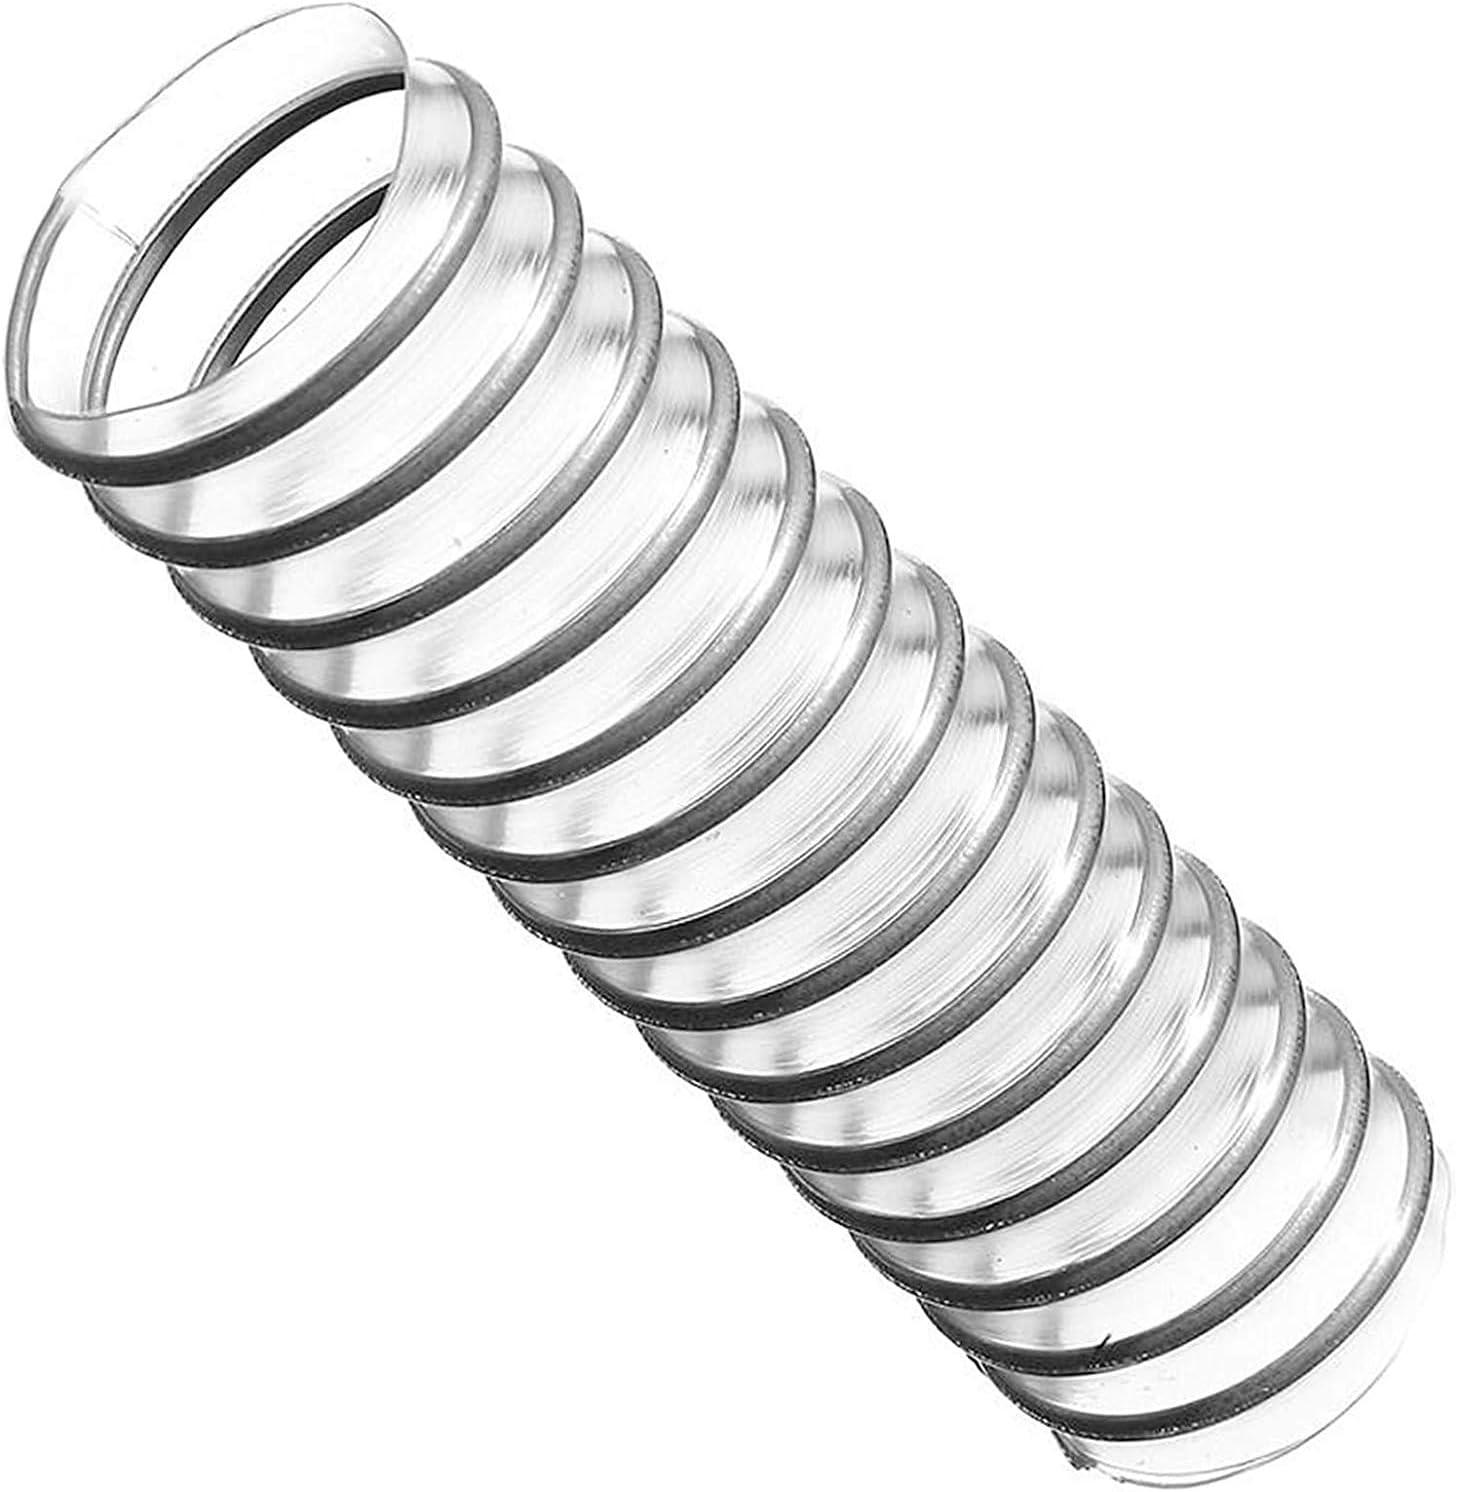 Lower Duct Hose /& Filter For SHARK Rotator NV601 NV680 NV801 Vacuum Cleaner Part